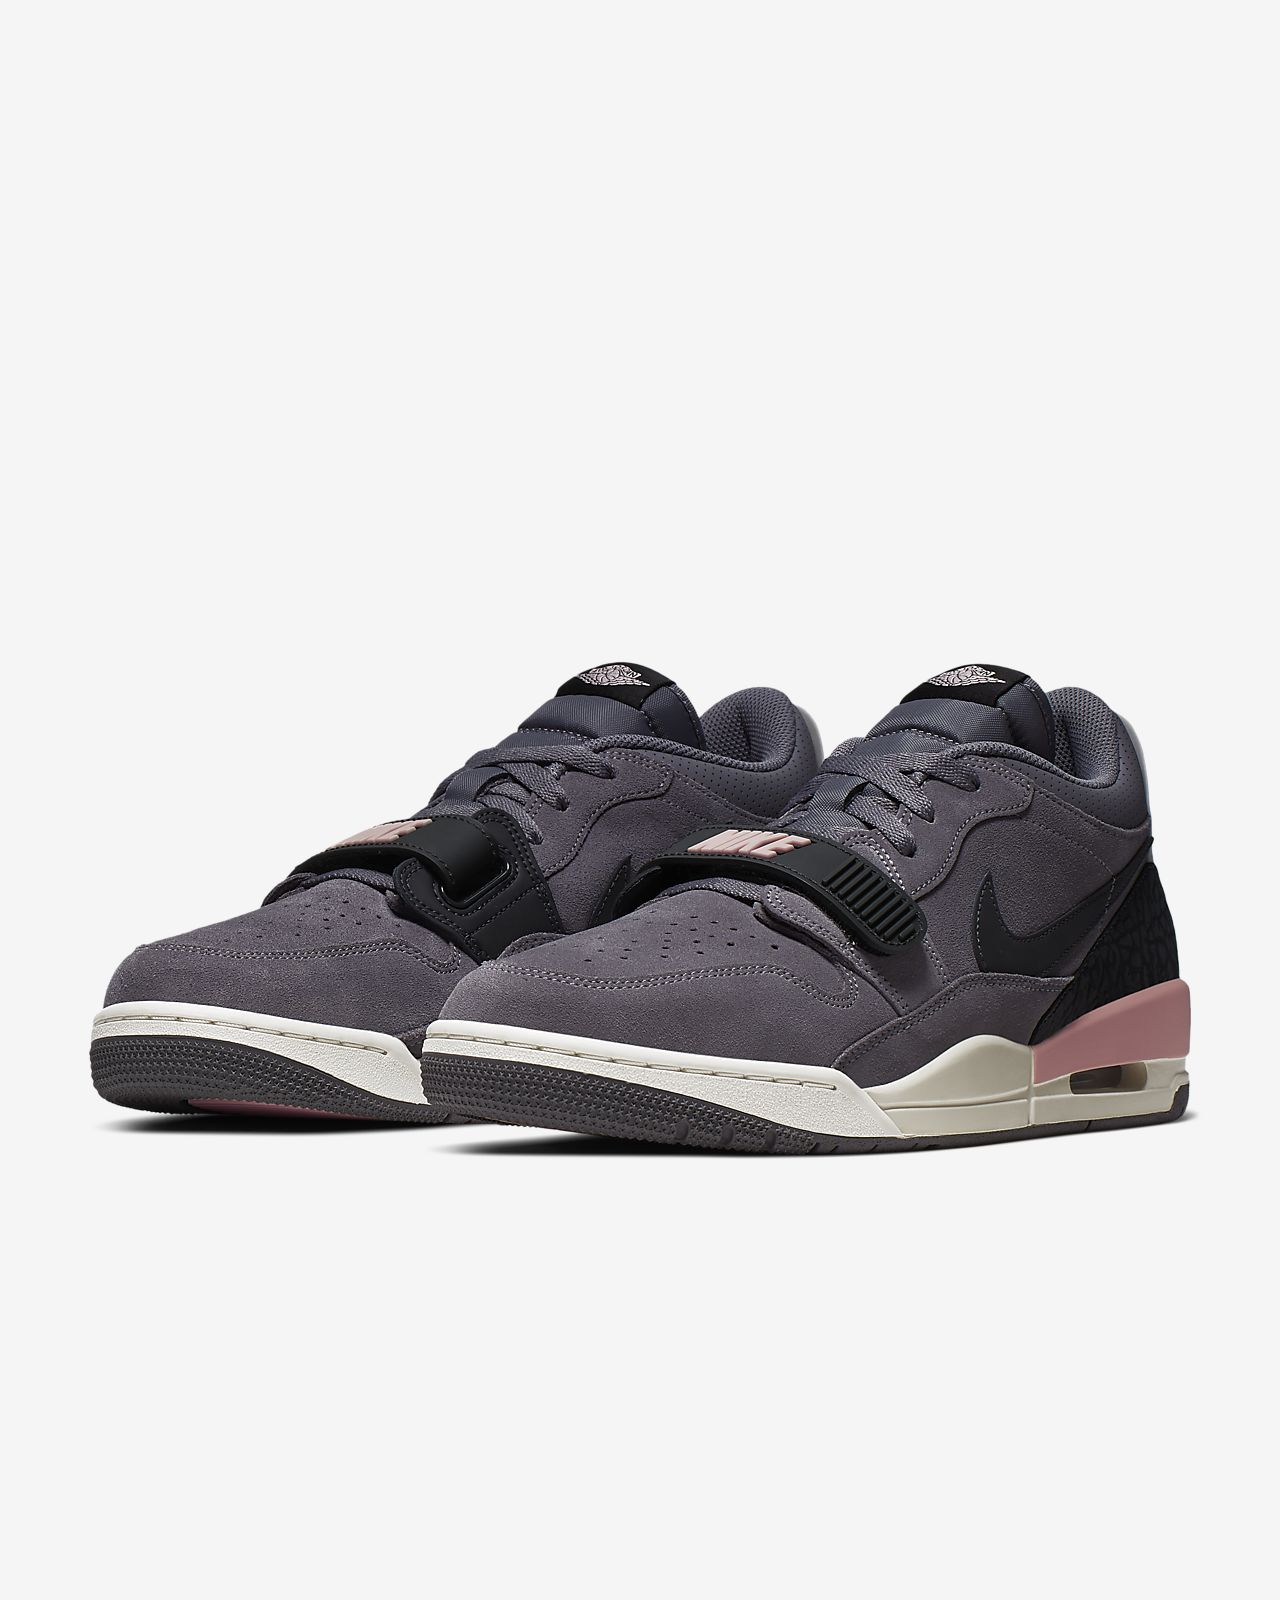 best sneakers latest design new lower prices Air Jordan Legacy 312 Low Men's Shoe